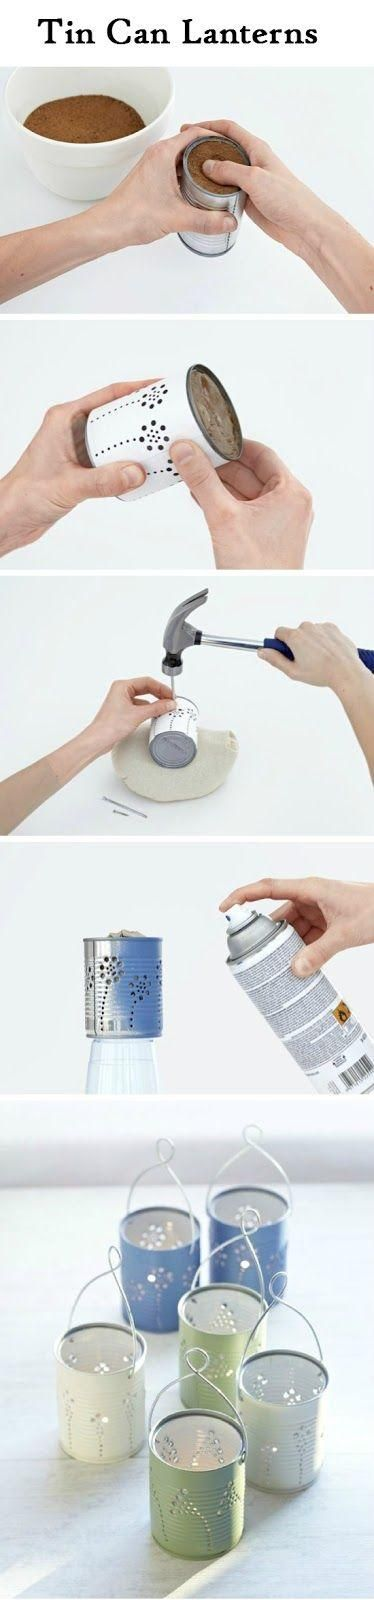 Crafts and DIY Community: Tin Can Lanterns | Crafts and DIY Community